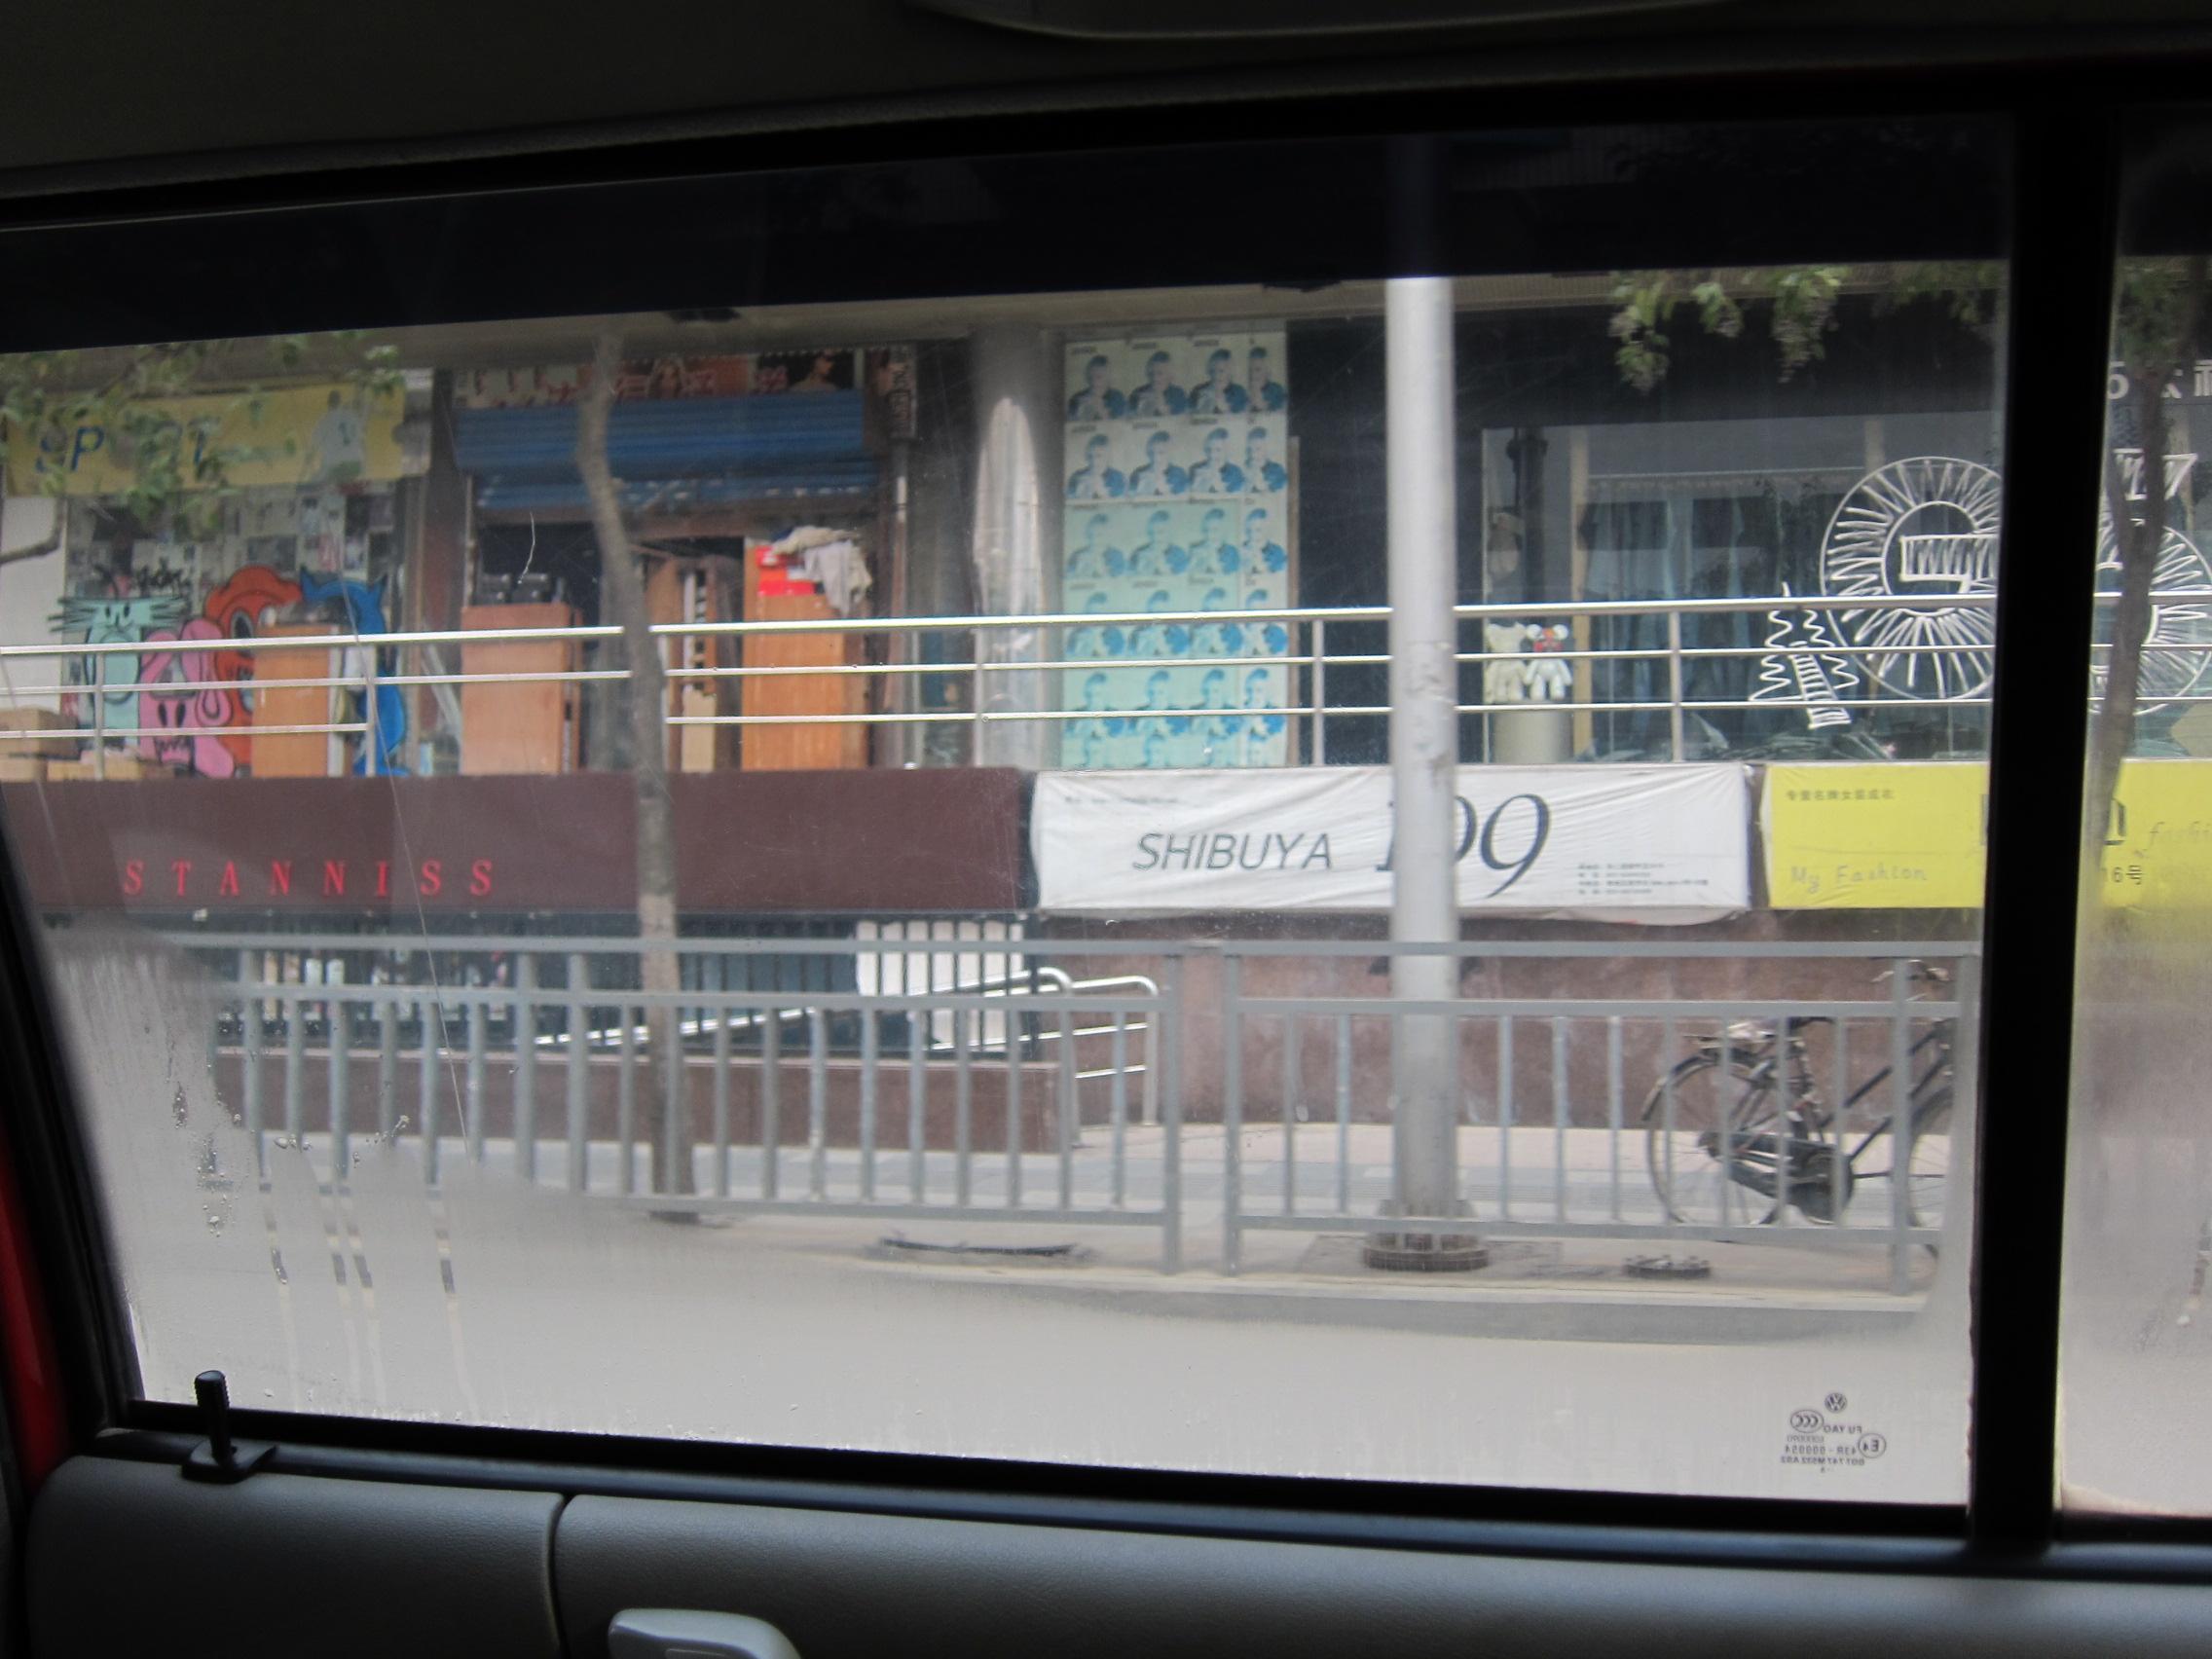 Shibuya 109 China